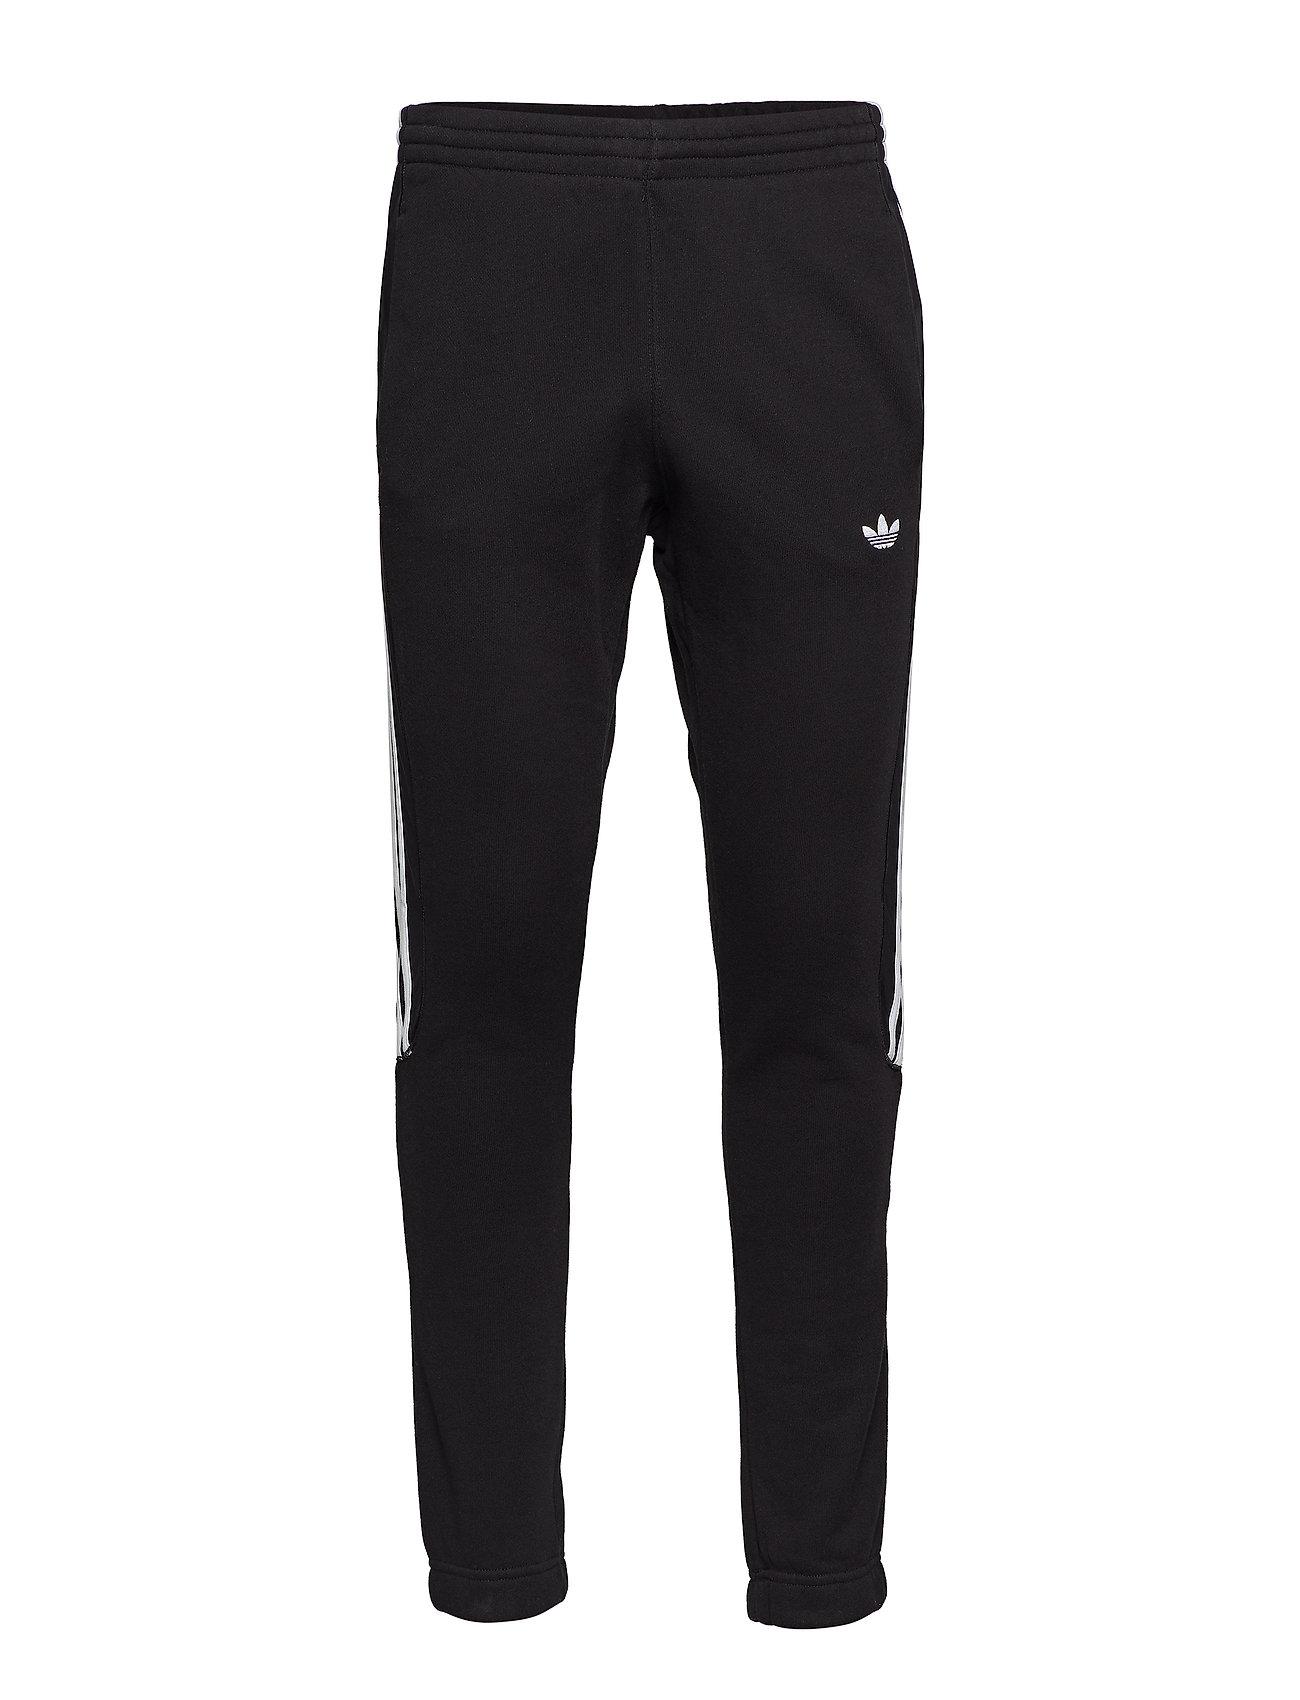 Adidas Originals RADKIN SP Joggingbyxor